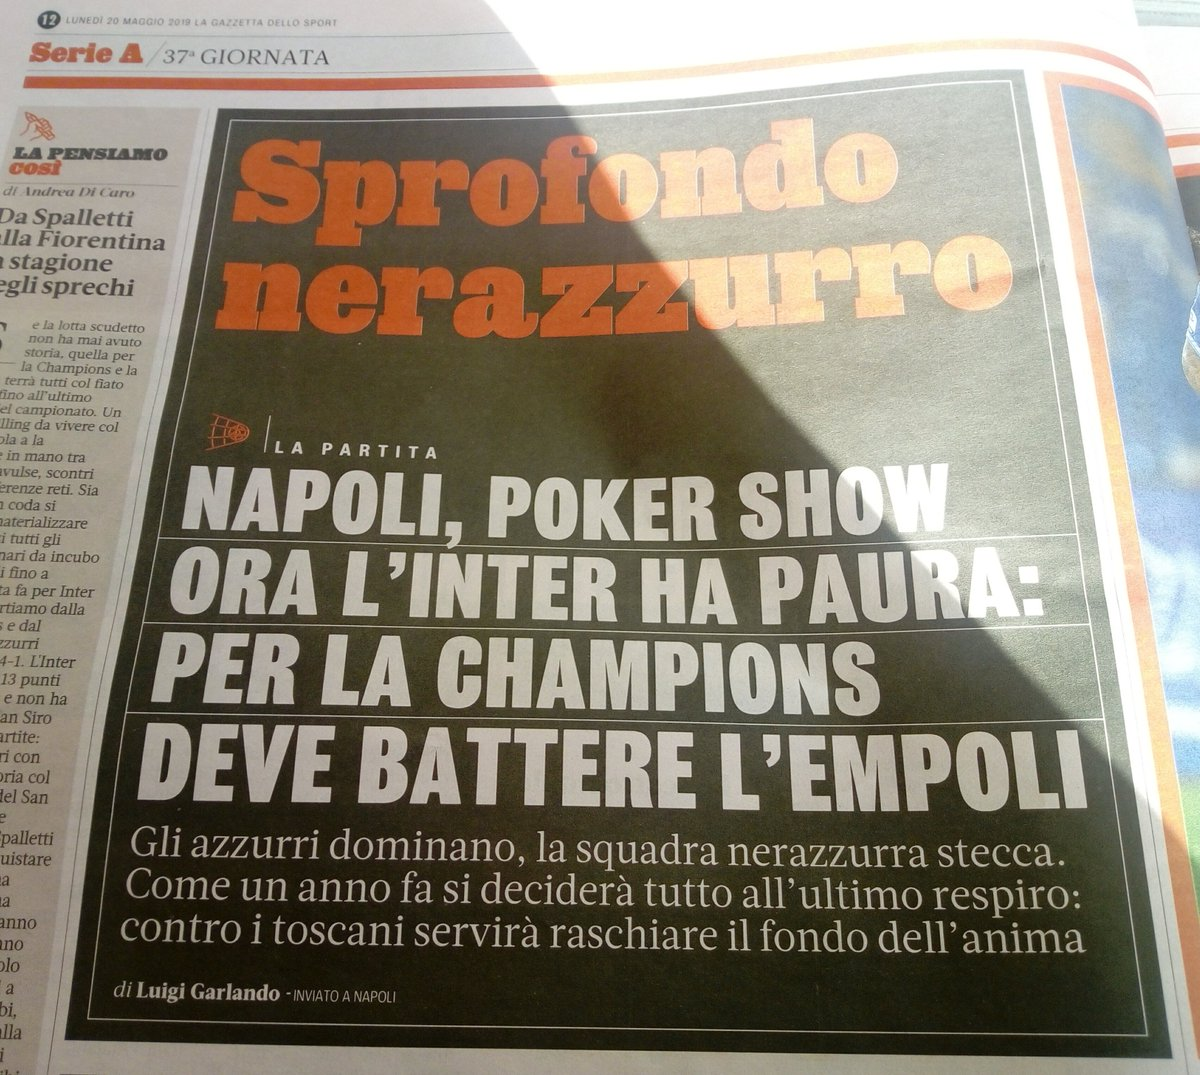 #NapoliInter